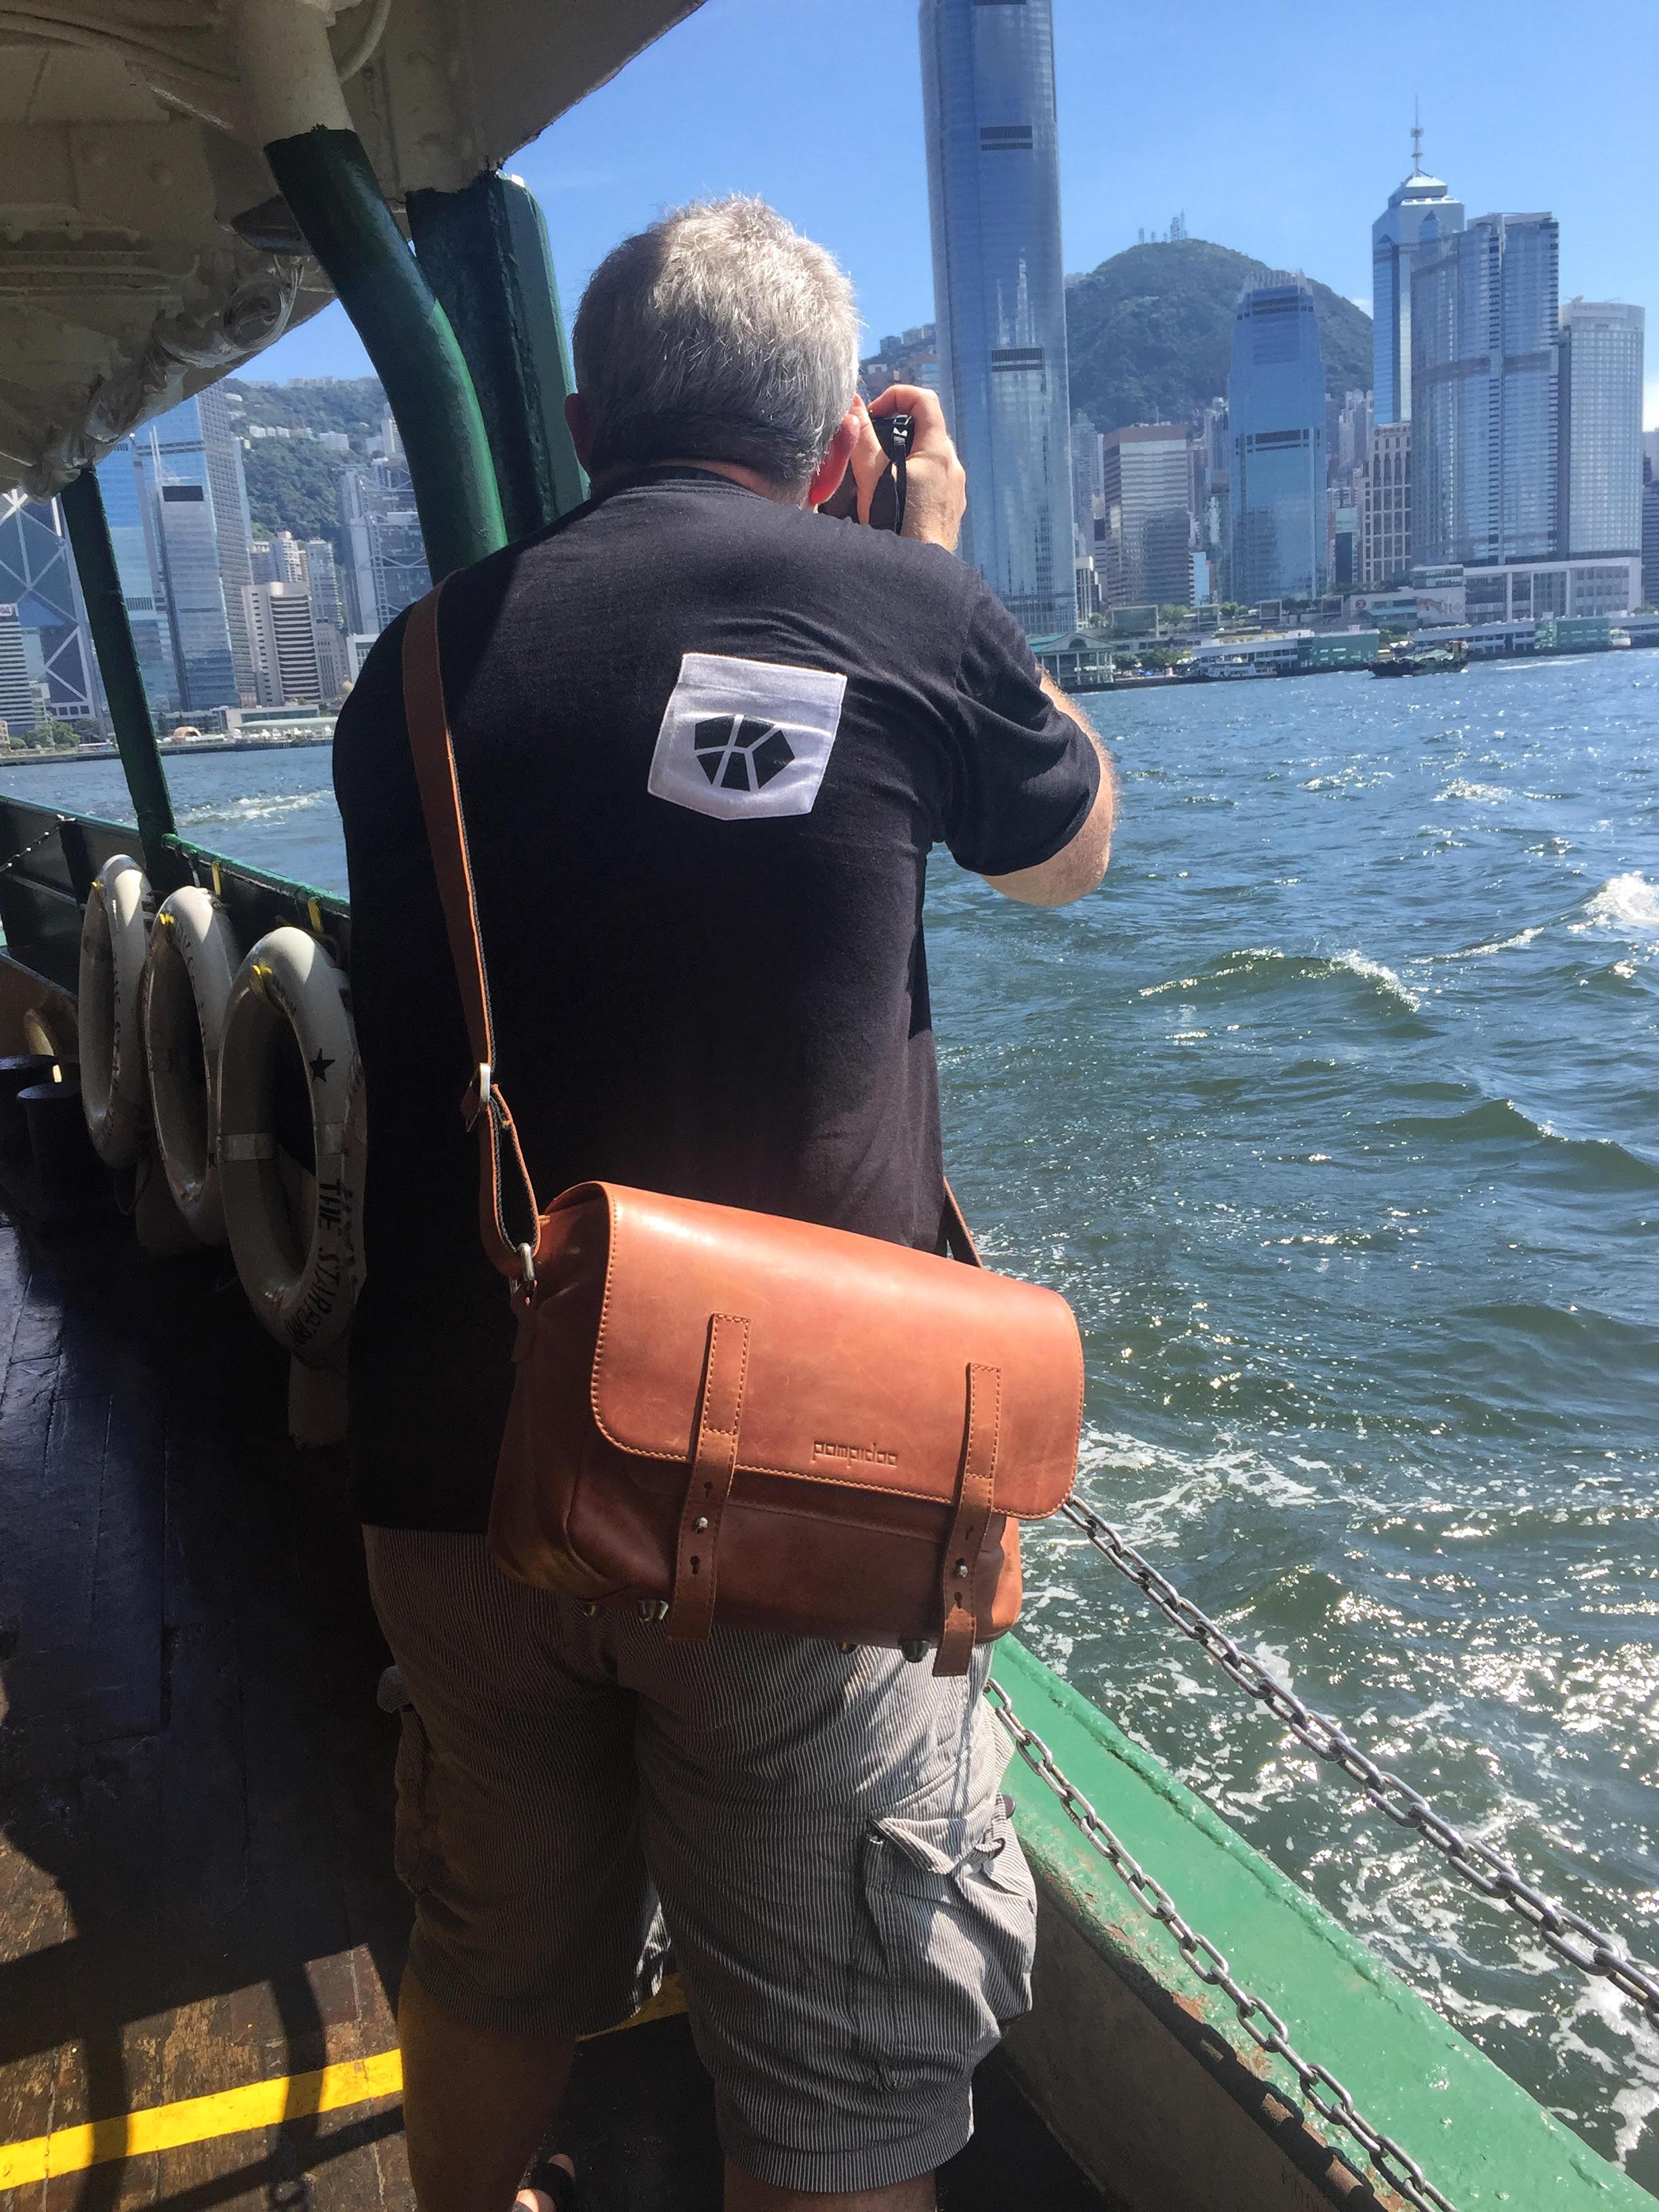 In action in Hong Kong